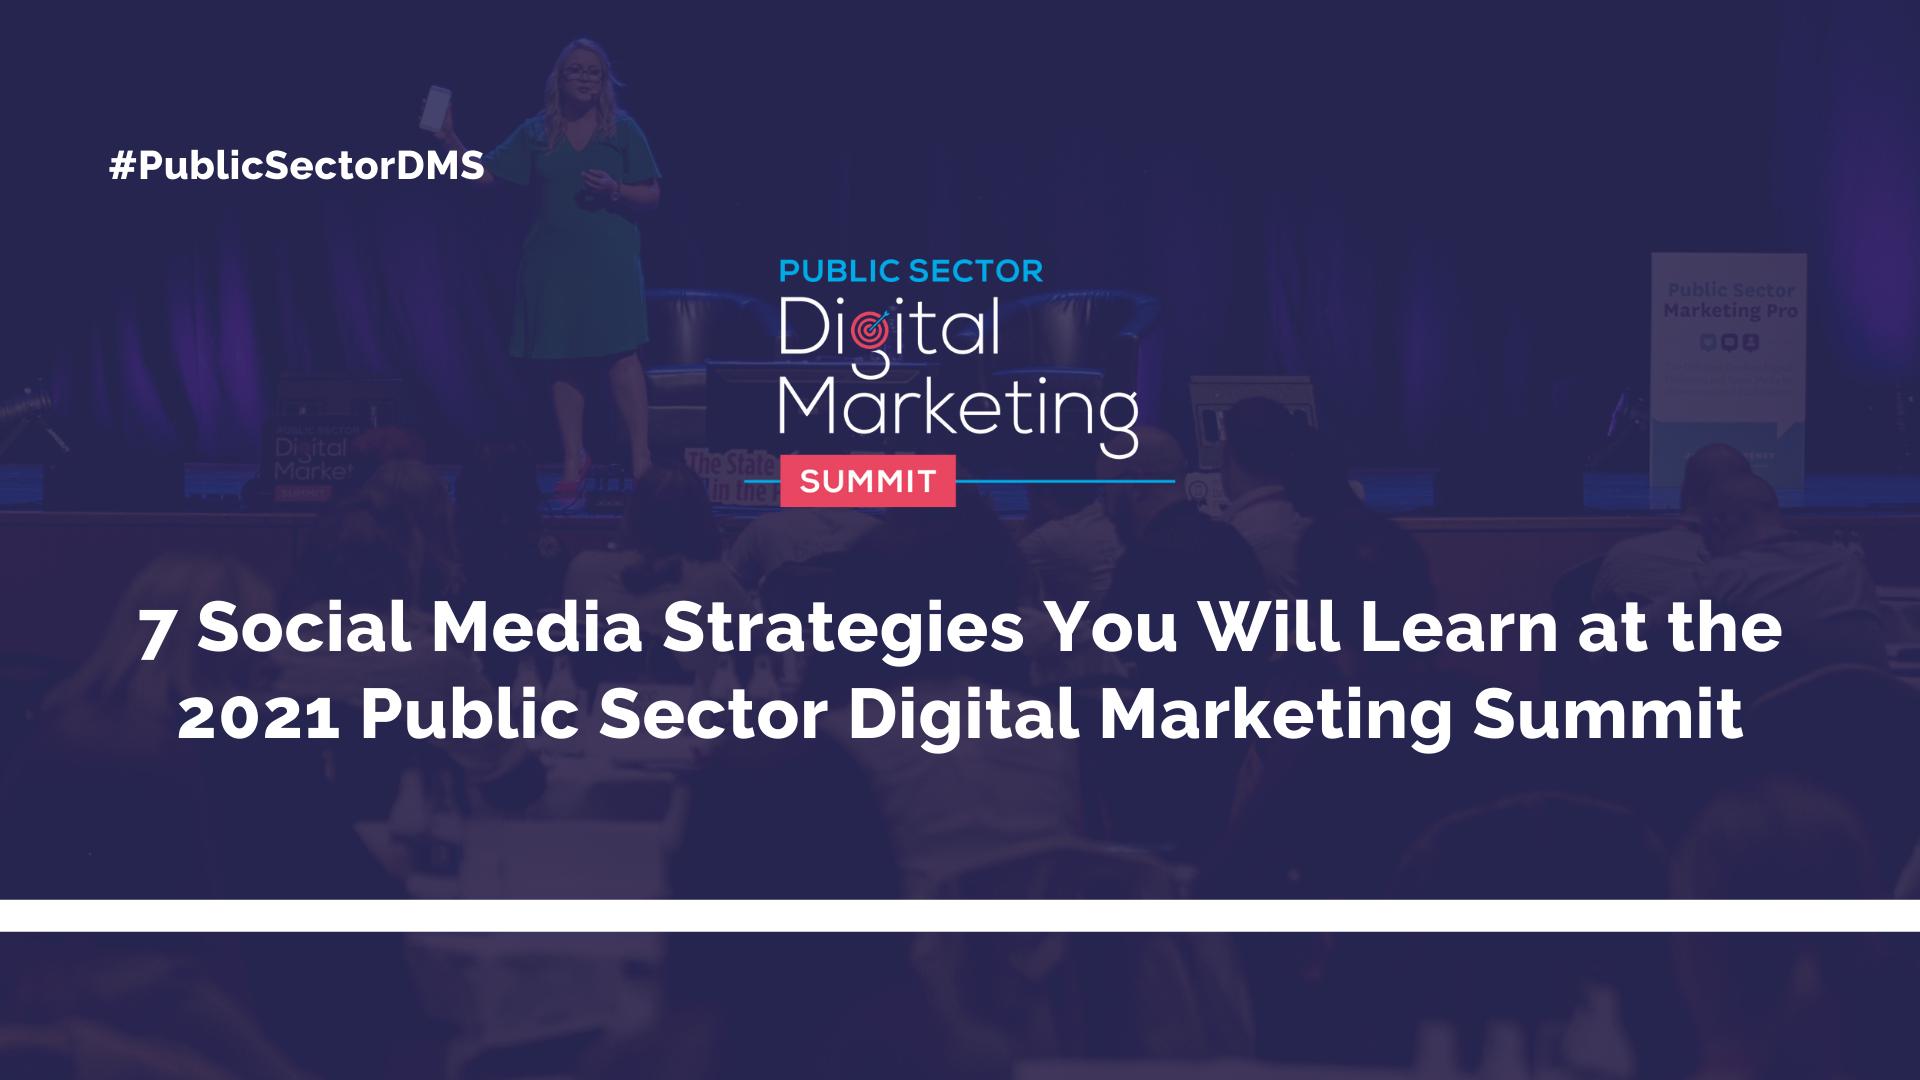 7 Social Media Strategies You Will Learn at the 2021 Public Sector Digital Marketing Summit